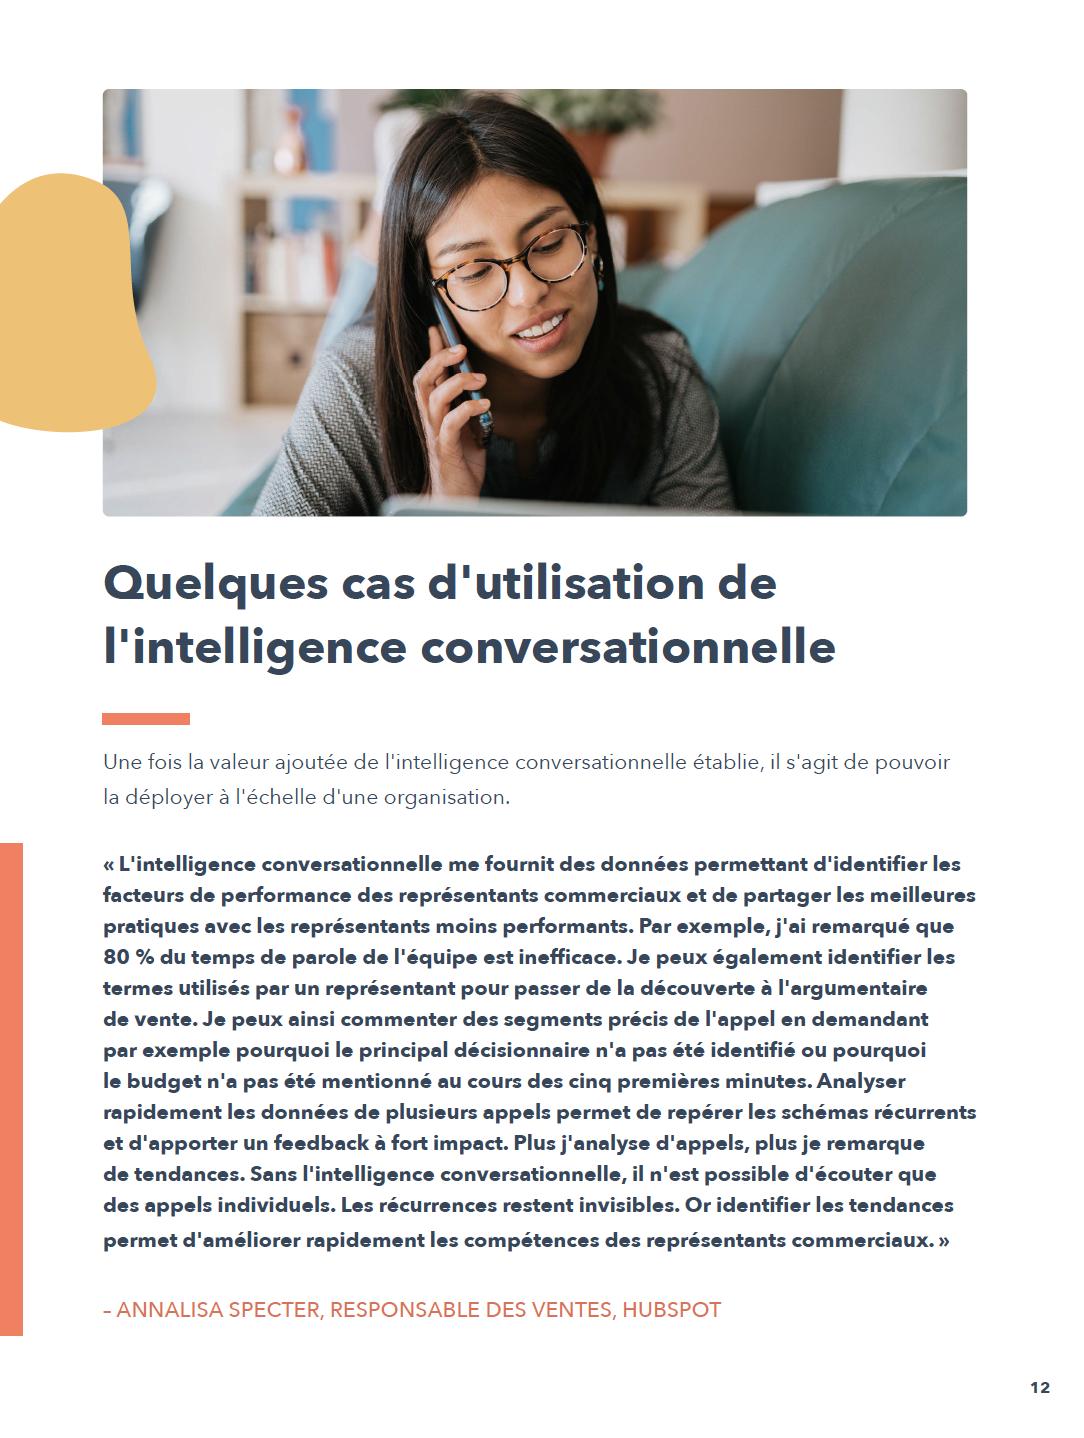 Utilisation intelligence connversationnelle